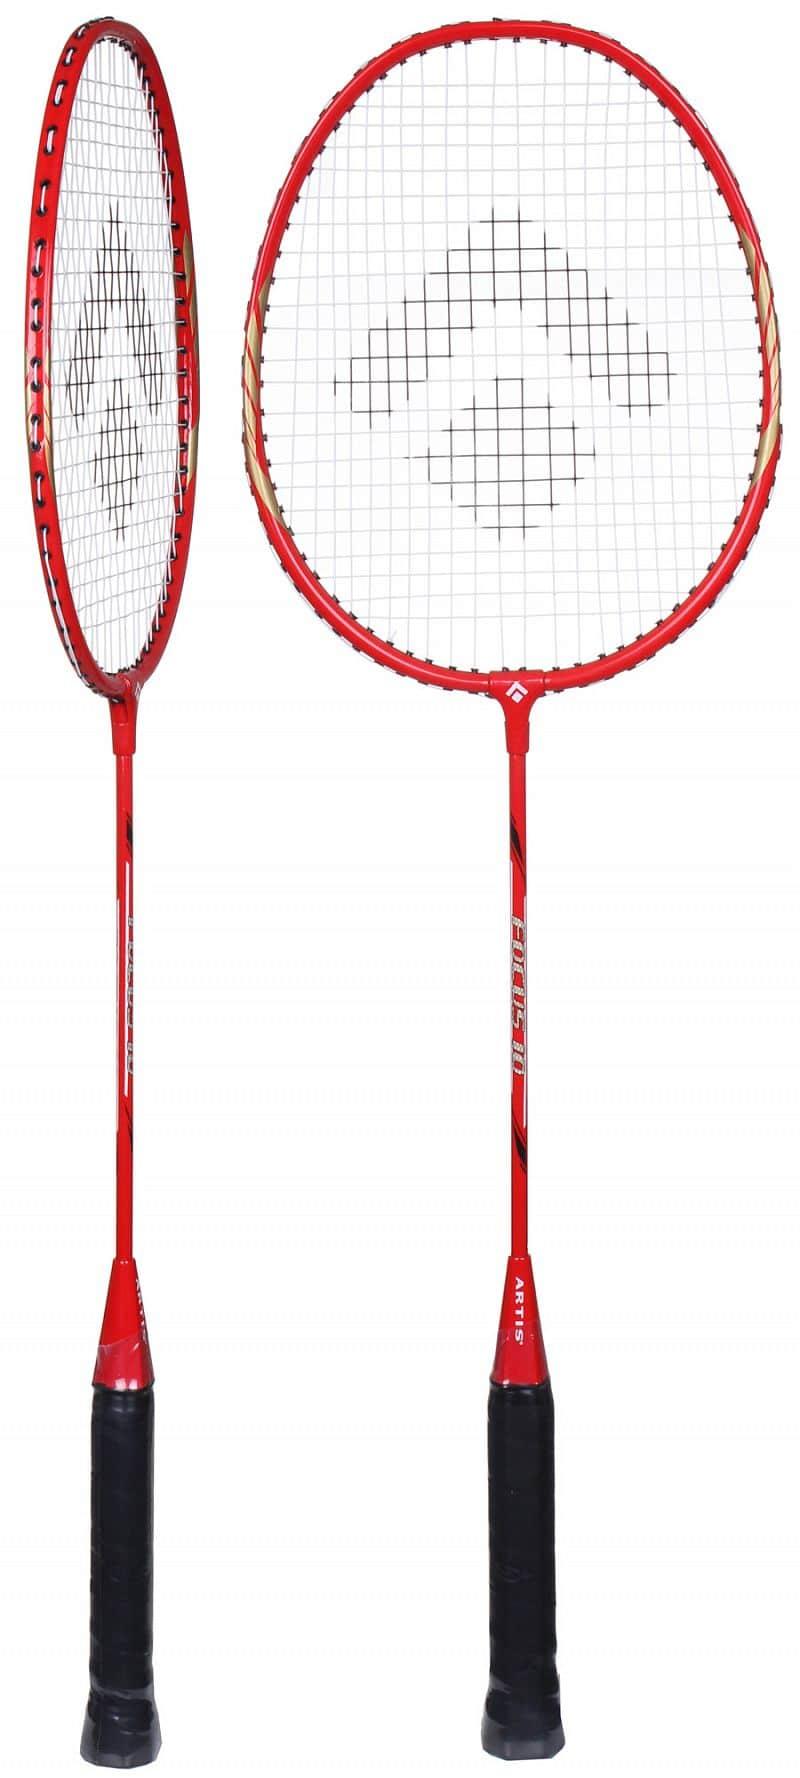 Focus 10 badmintonová raketa